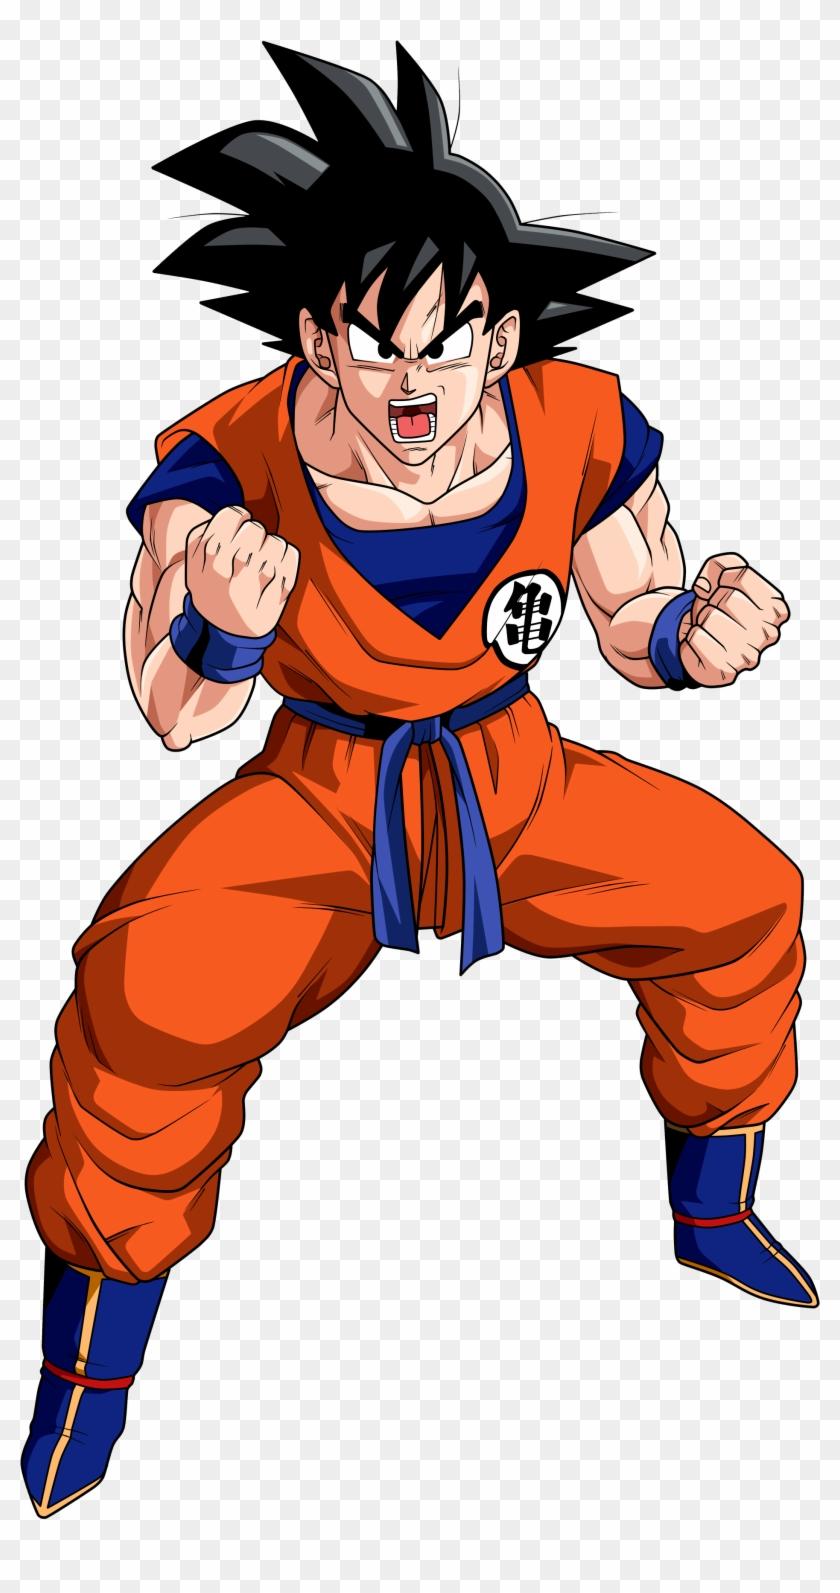 Dragon Ball Goku Png Free Download - Goku Dragon Ball Z Clipart #1211688